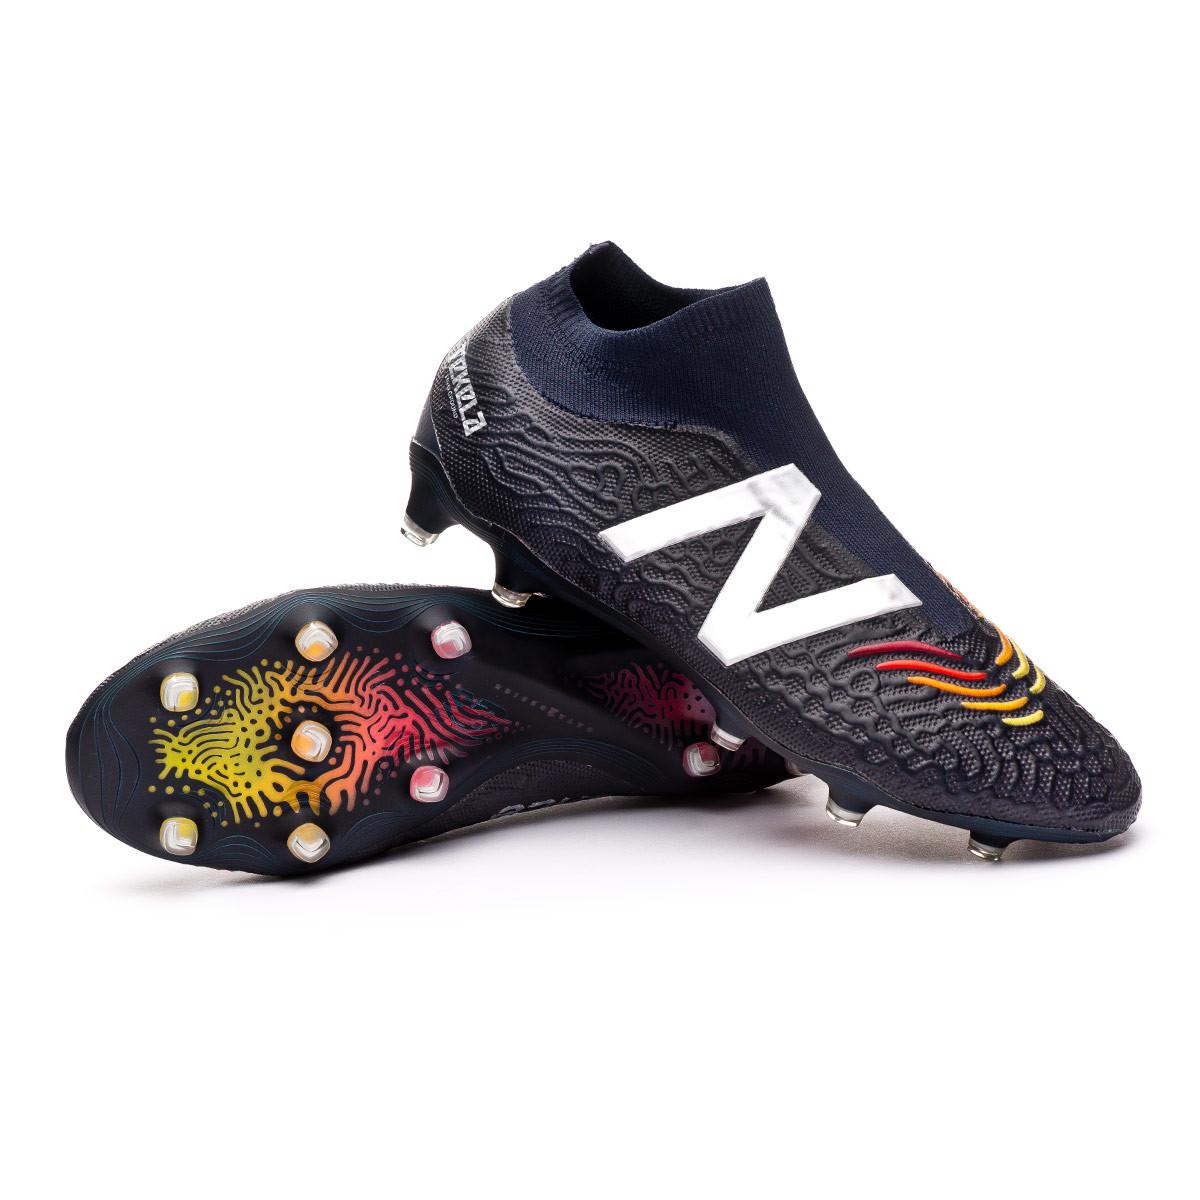 New Balance Pro Tekela V3 FG